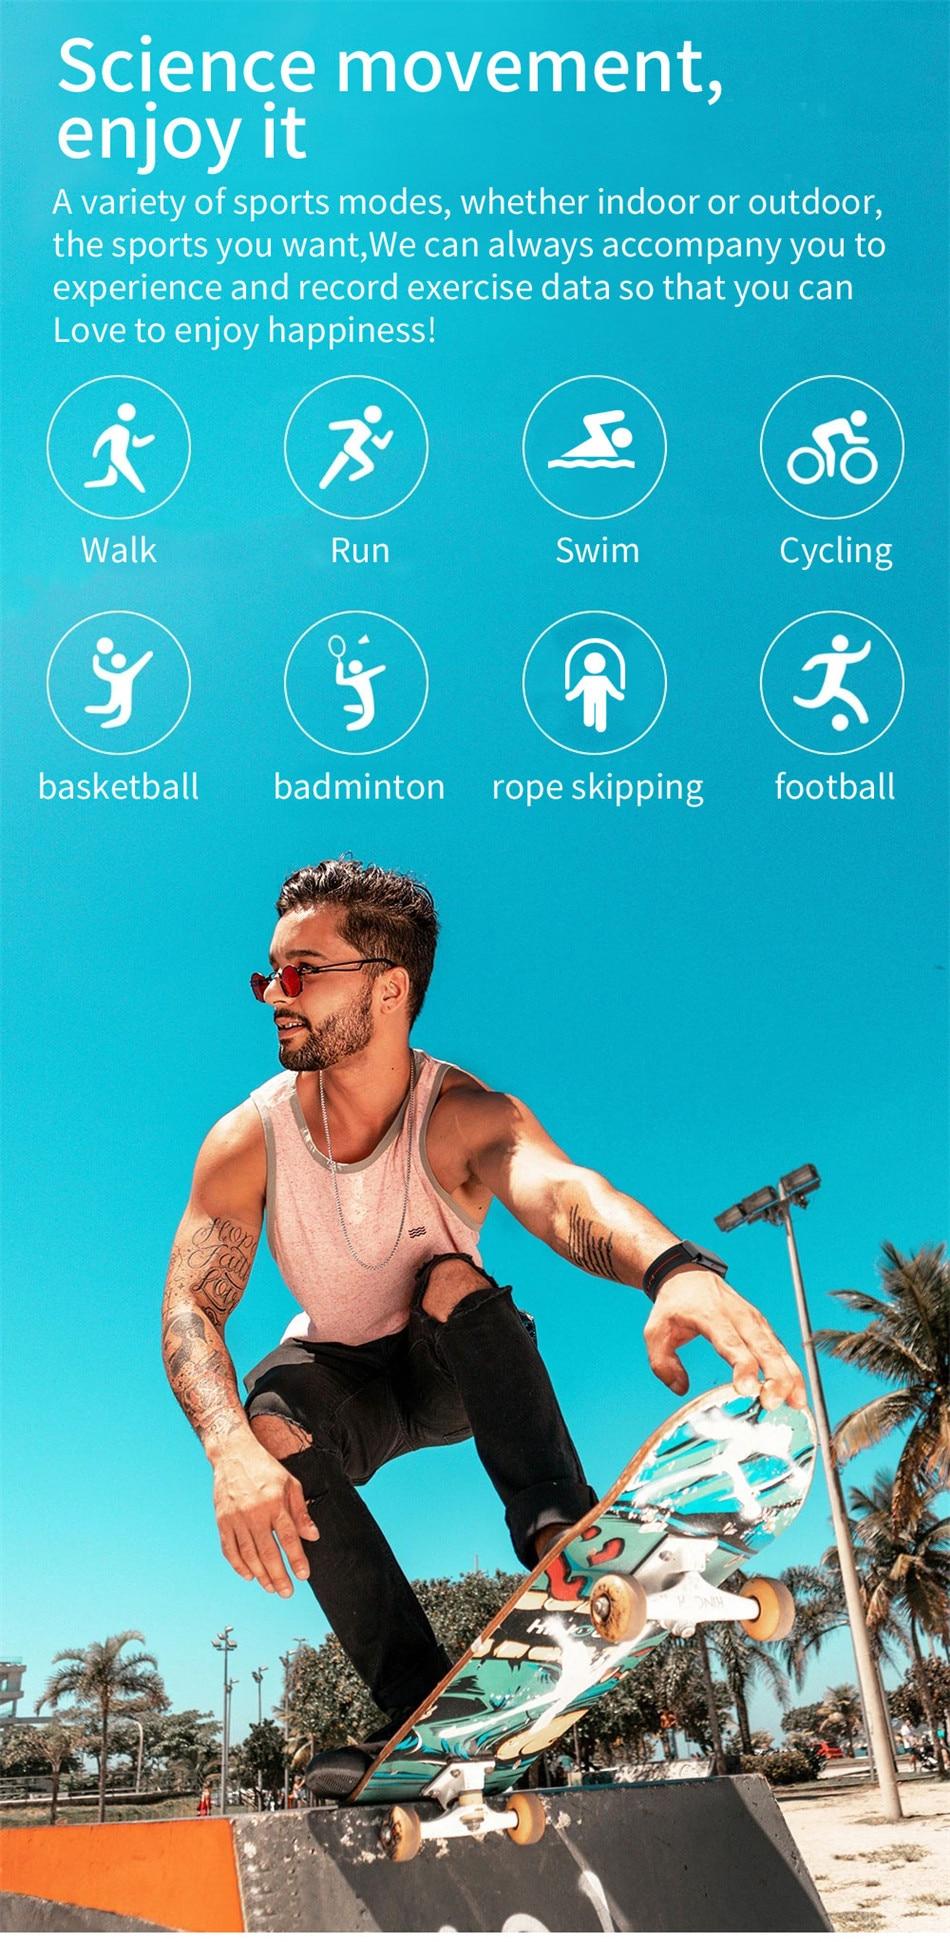 H89d44991be0f42beab27bbdb7b2a71baF New Smart Band Watch Fitness Tracker Bracelet Waterproof Smartwatch Heart Rate Monitor Blood Oxygen LED Screen For Huawei Xiaomi